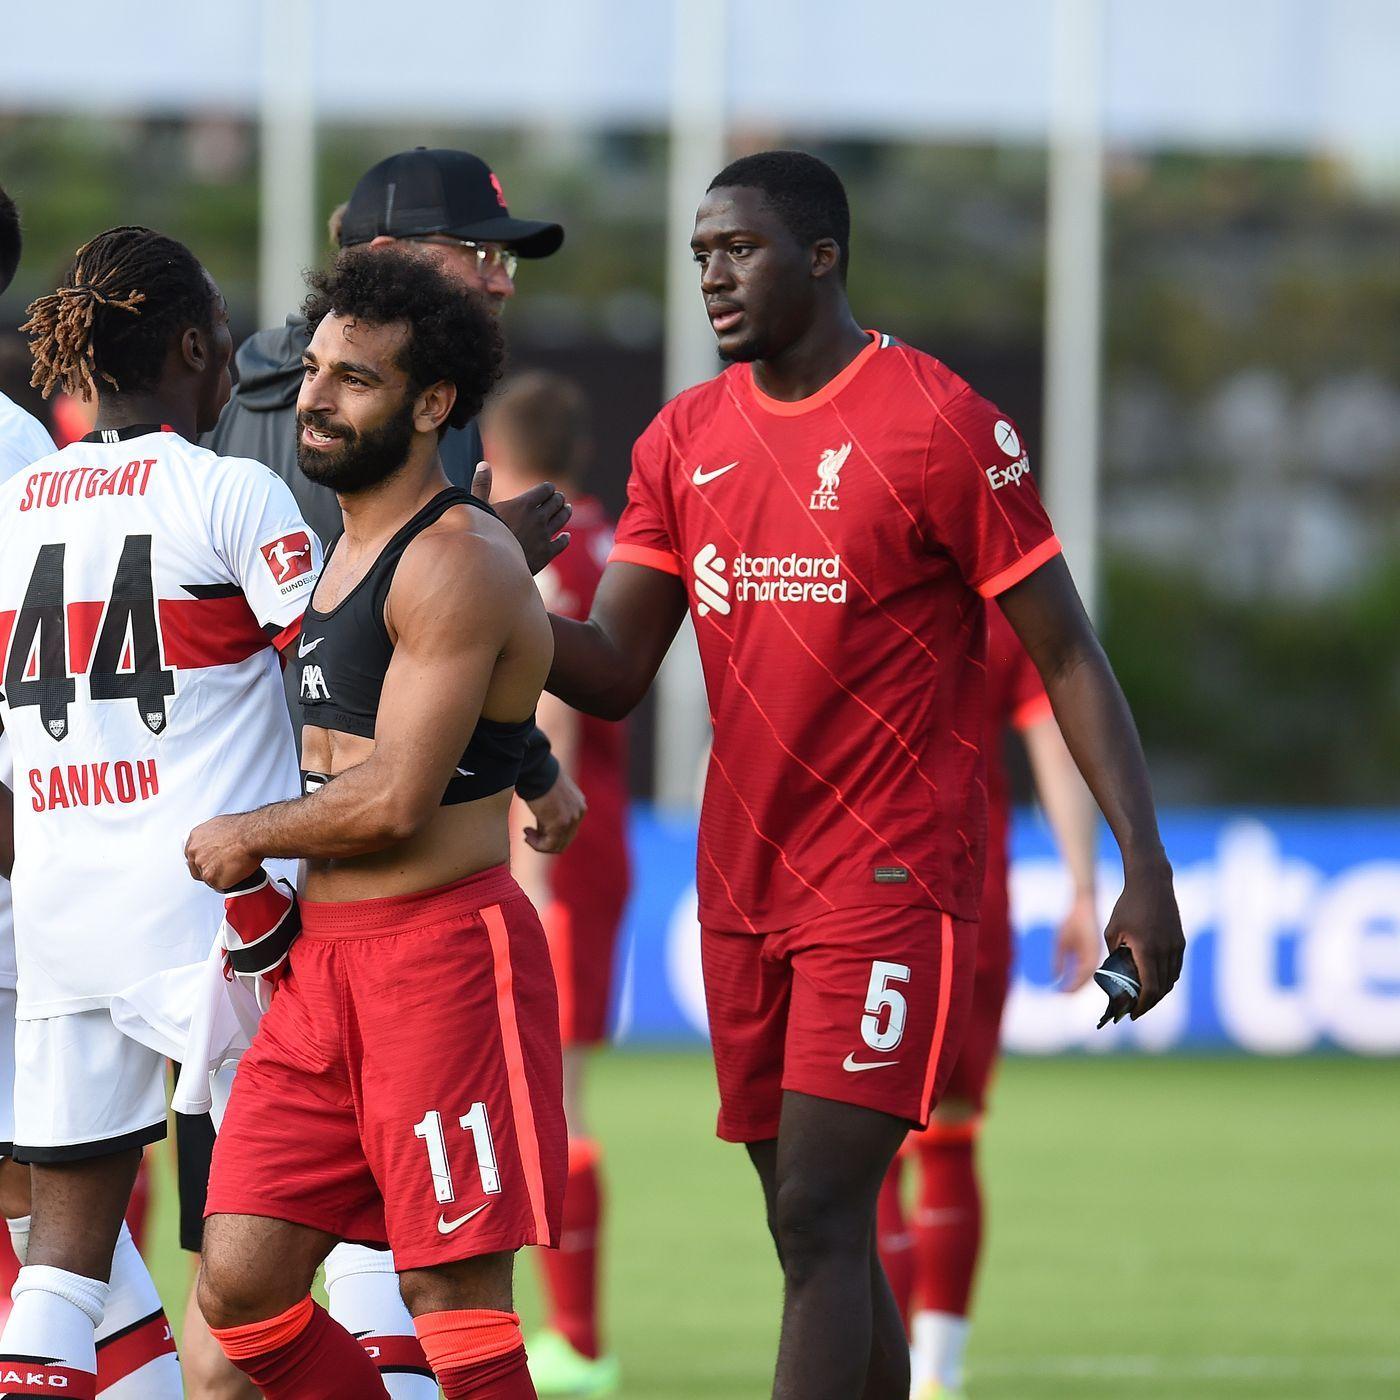 Post-Game: Ibrahima Konate makes first Reds appearance in pre-season run-outs against Wacker Innsbruck & Stuttgart